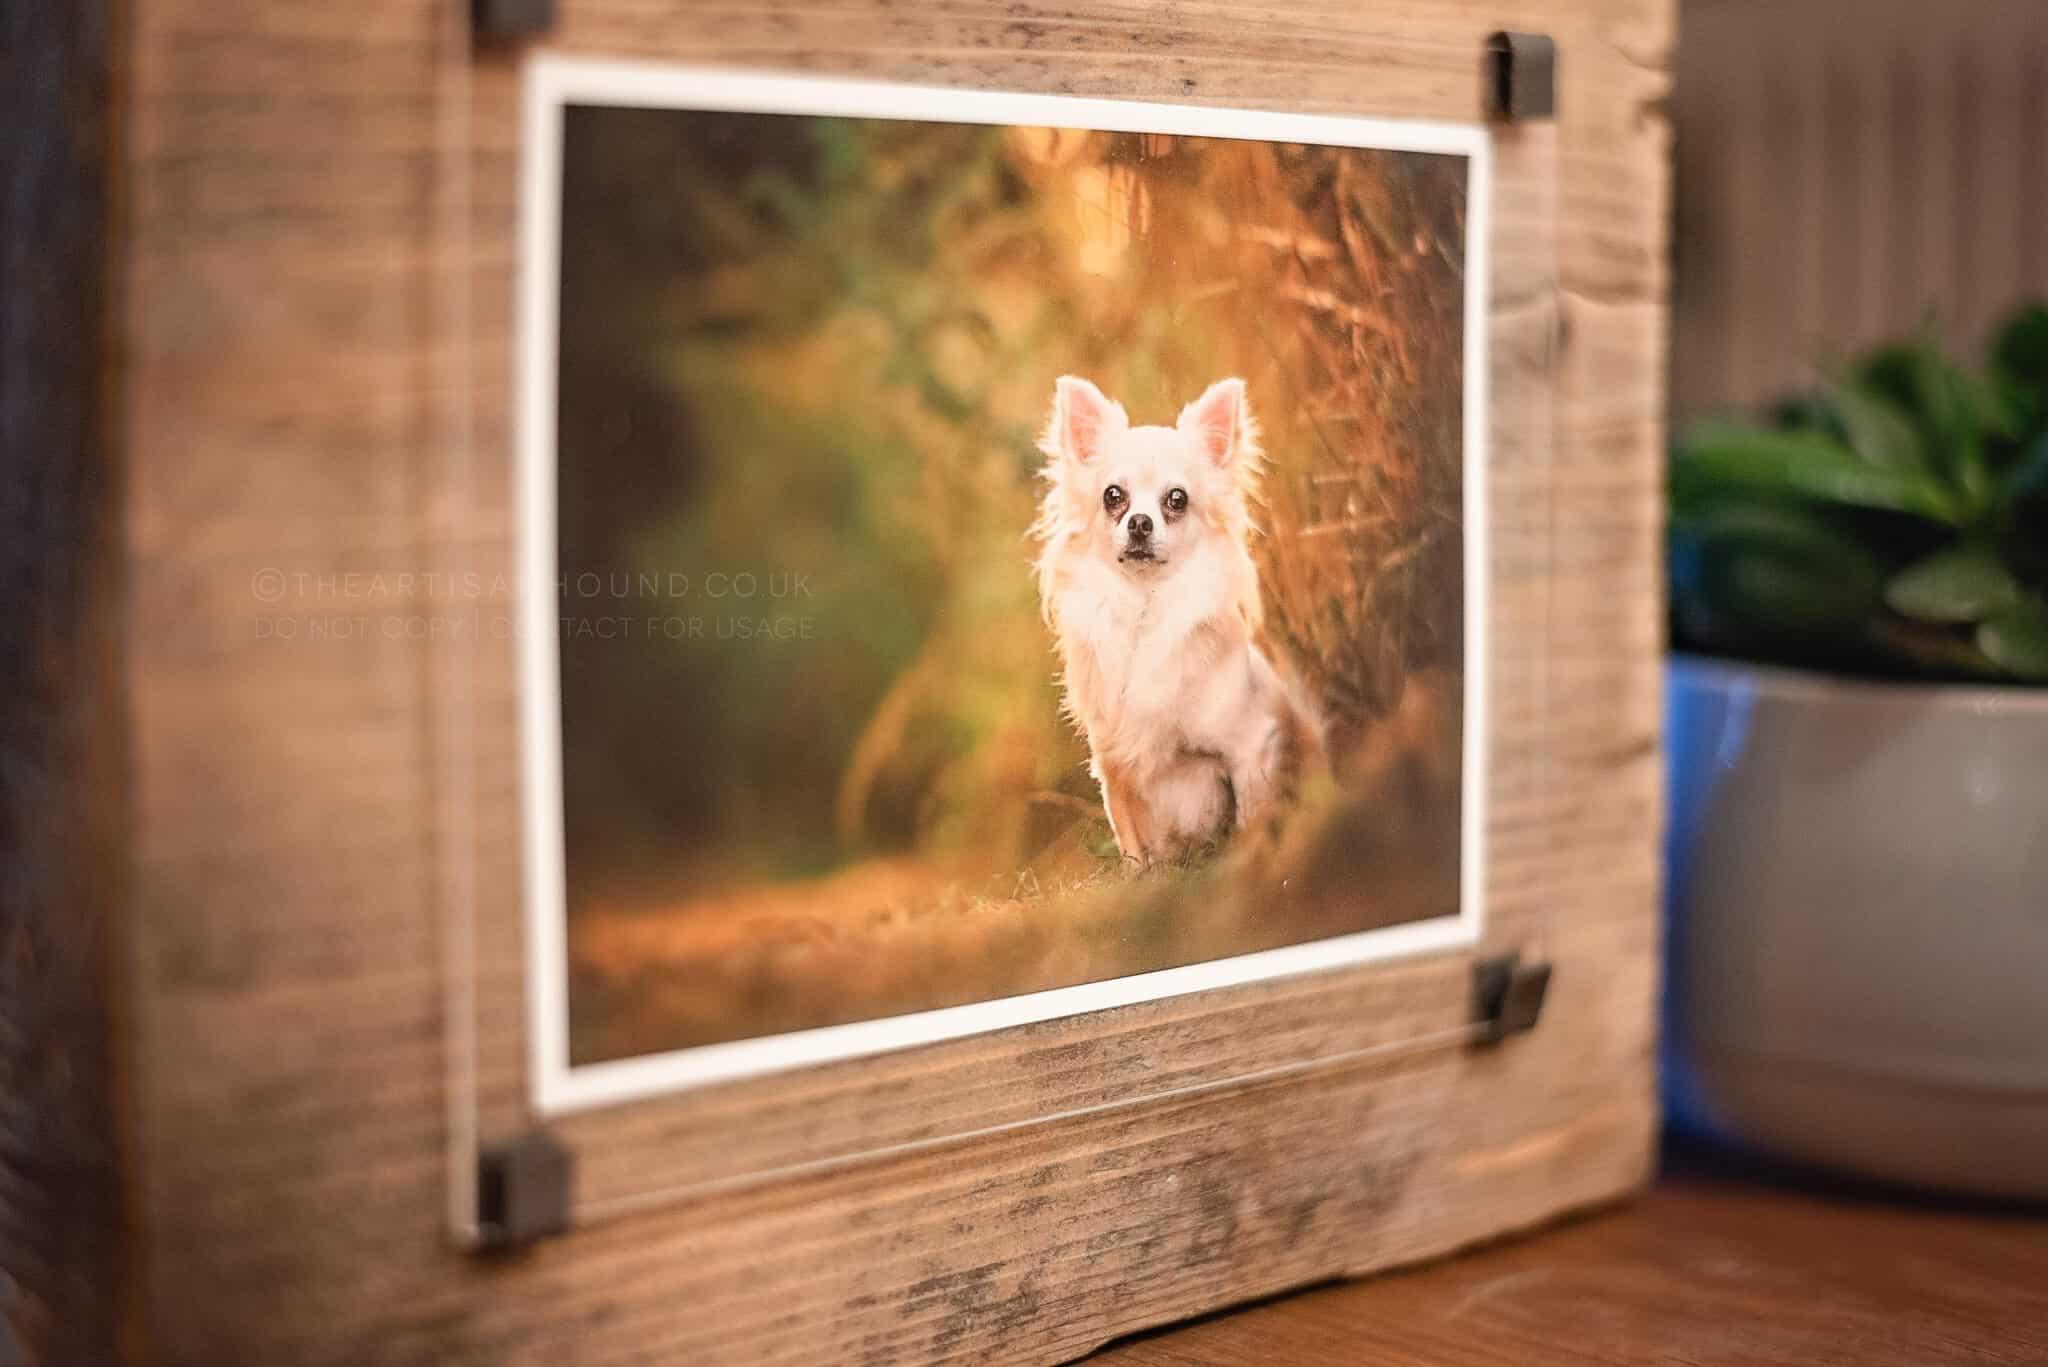 fine art print mounted on wood